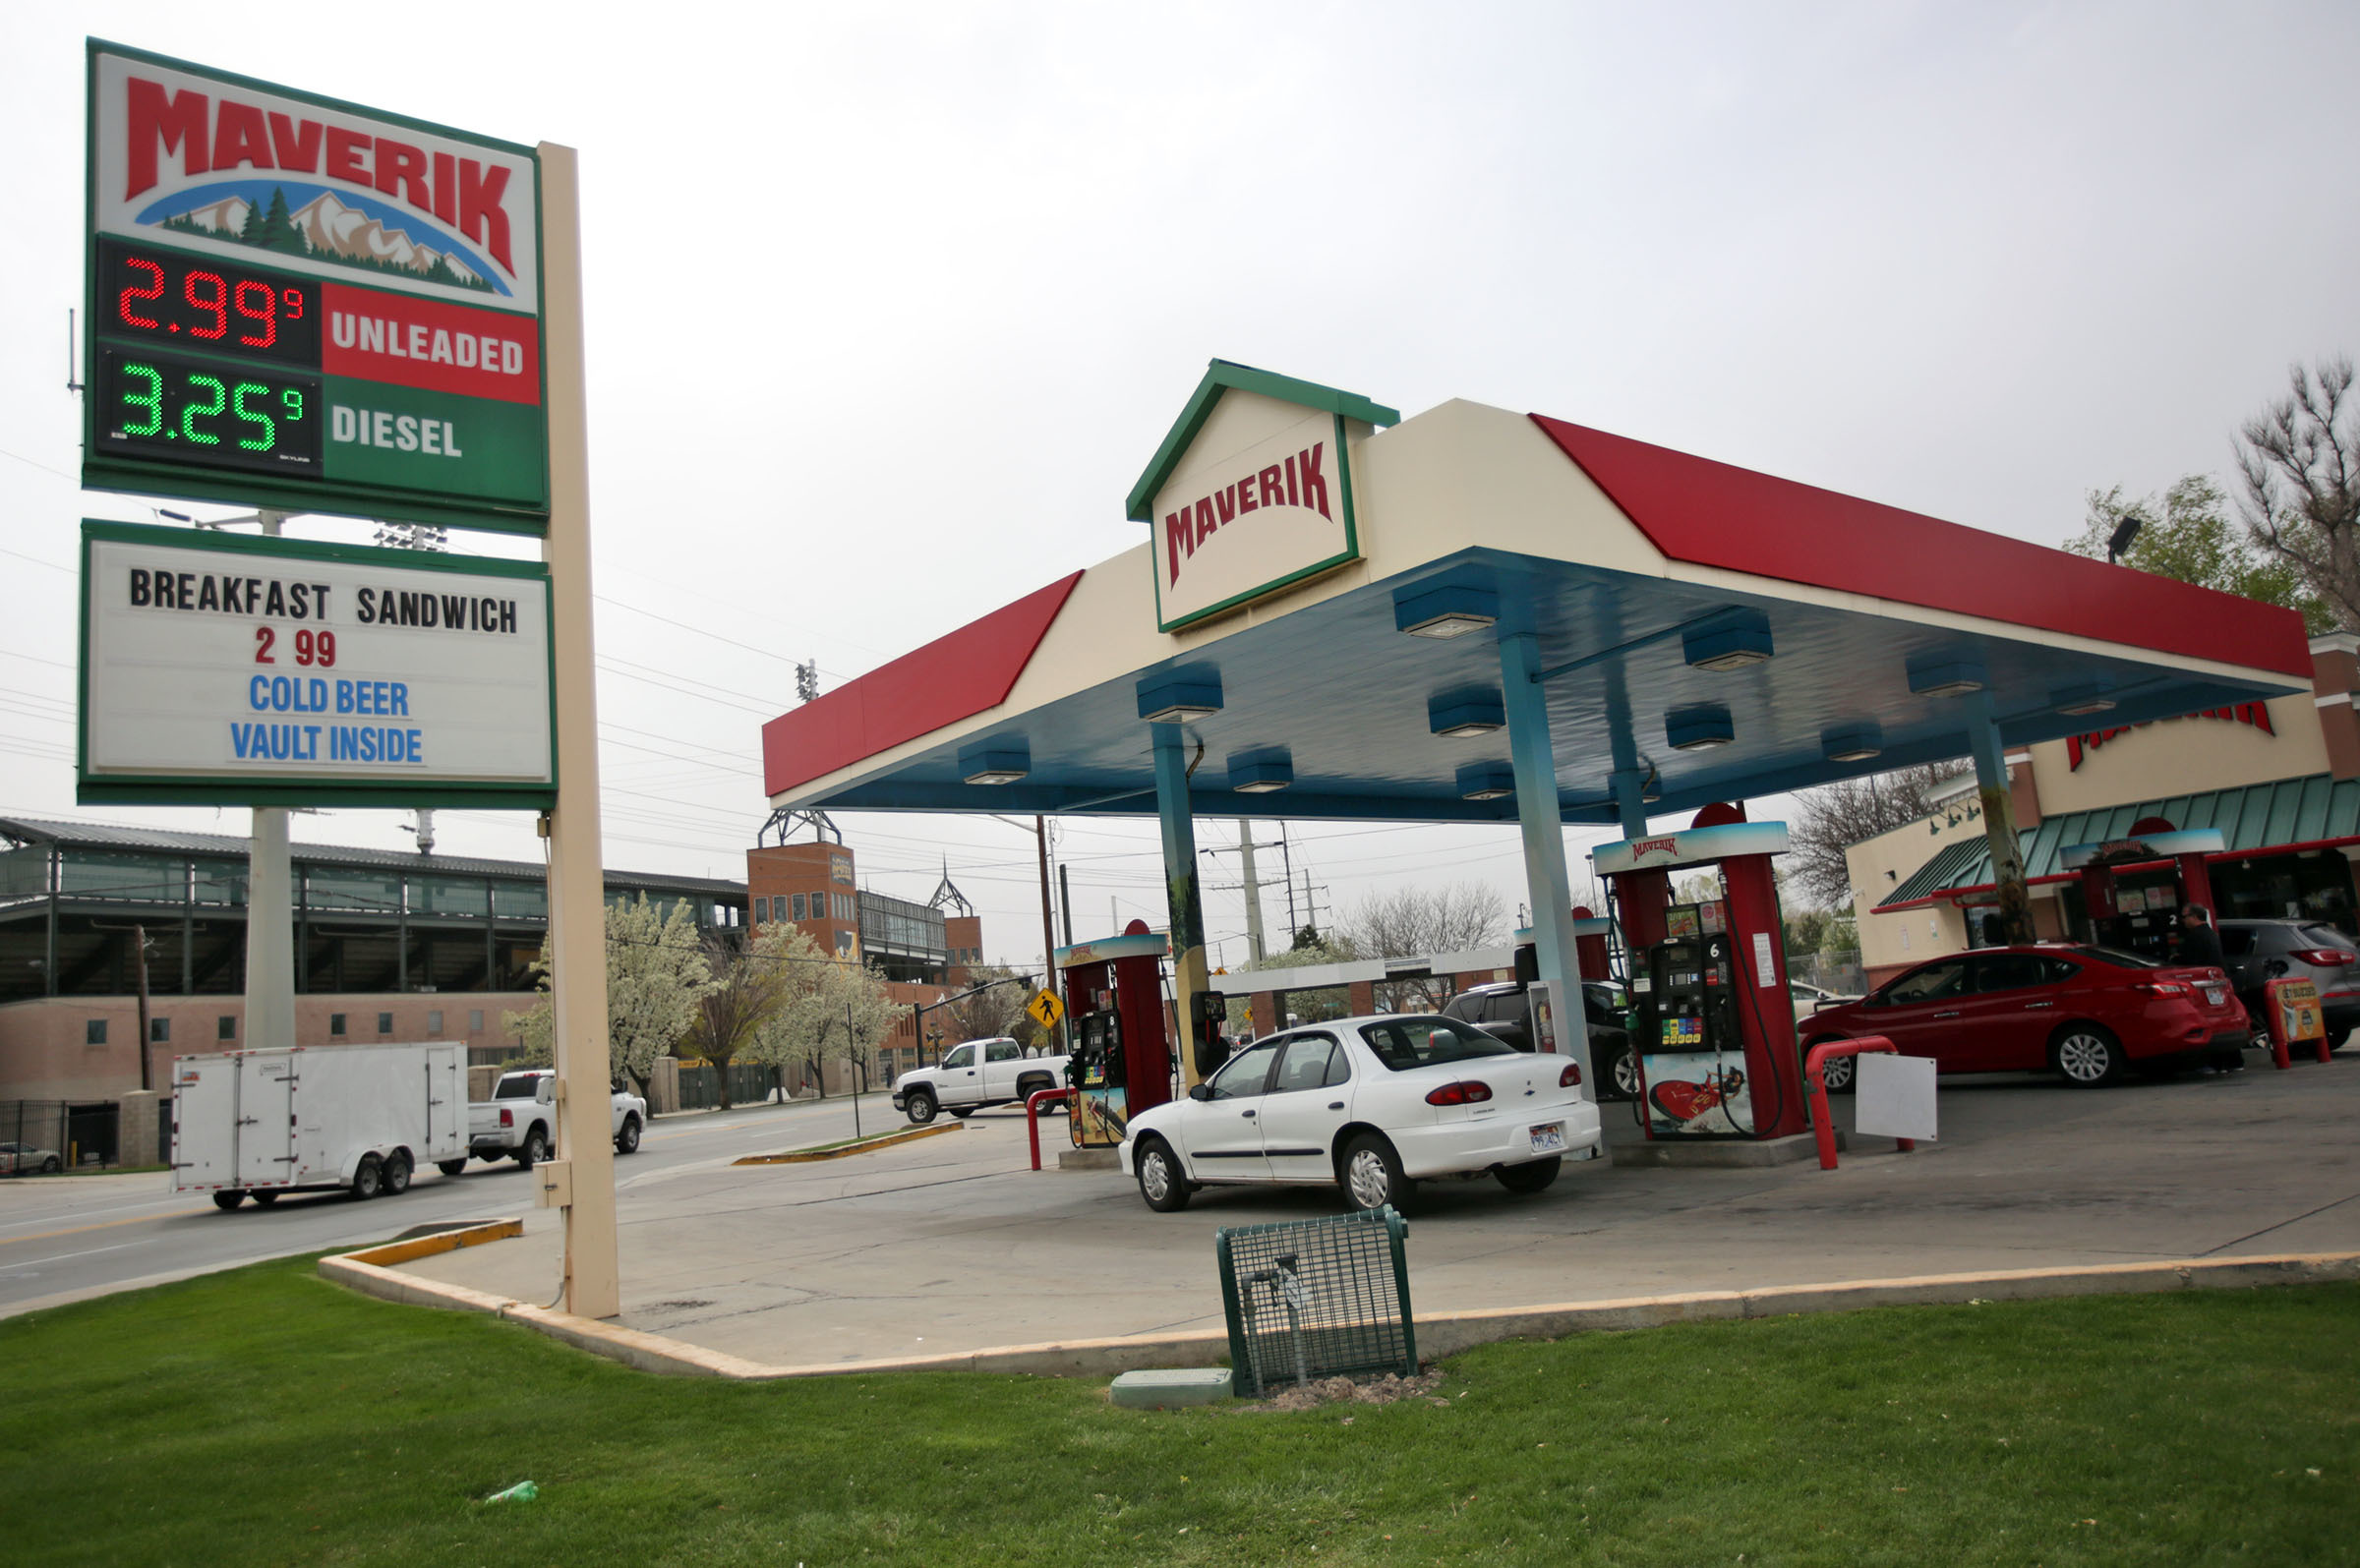 People pump gas at Maverick gas station in Salt Lake City on Monday, April 16, 2018.